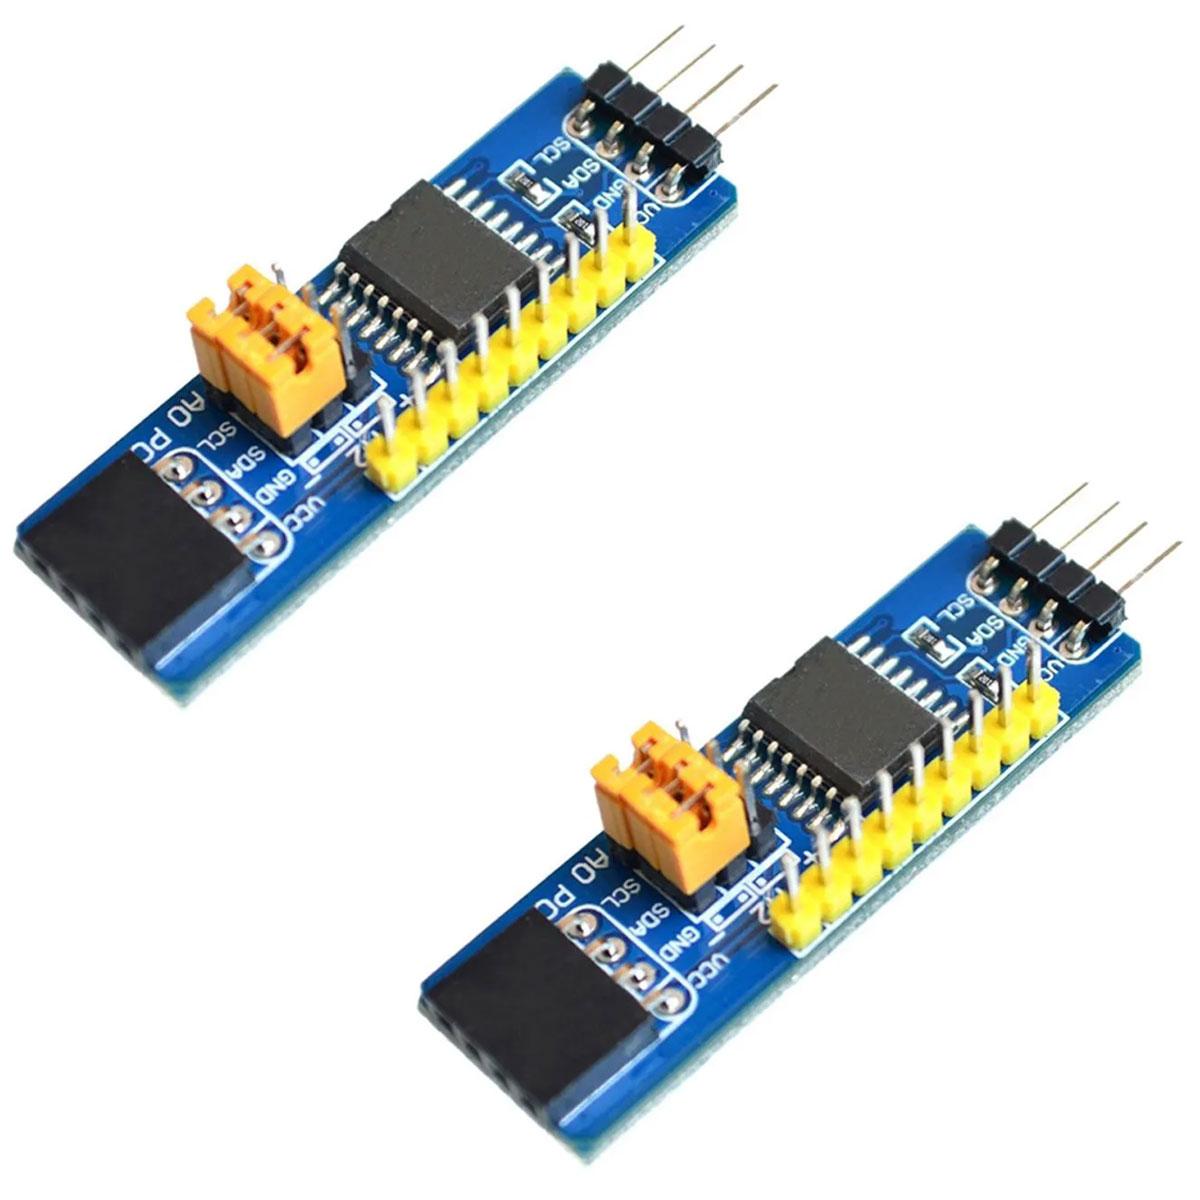 2x Módulo Expansor de Portas I2c 8 Bits PCF8574